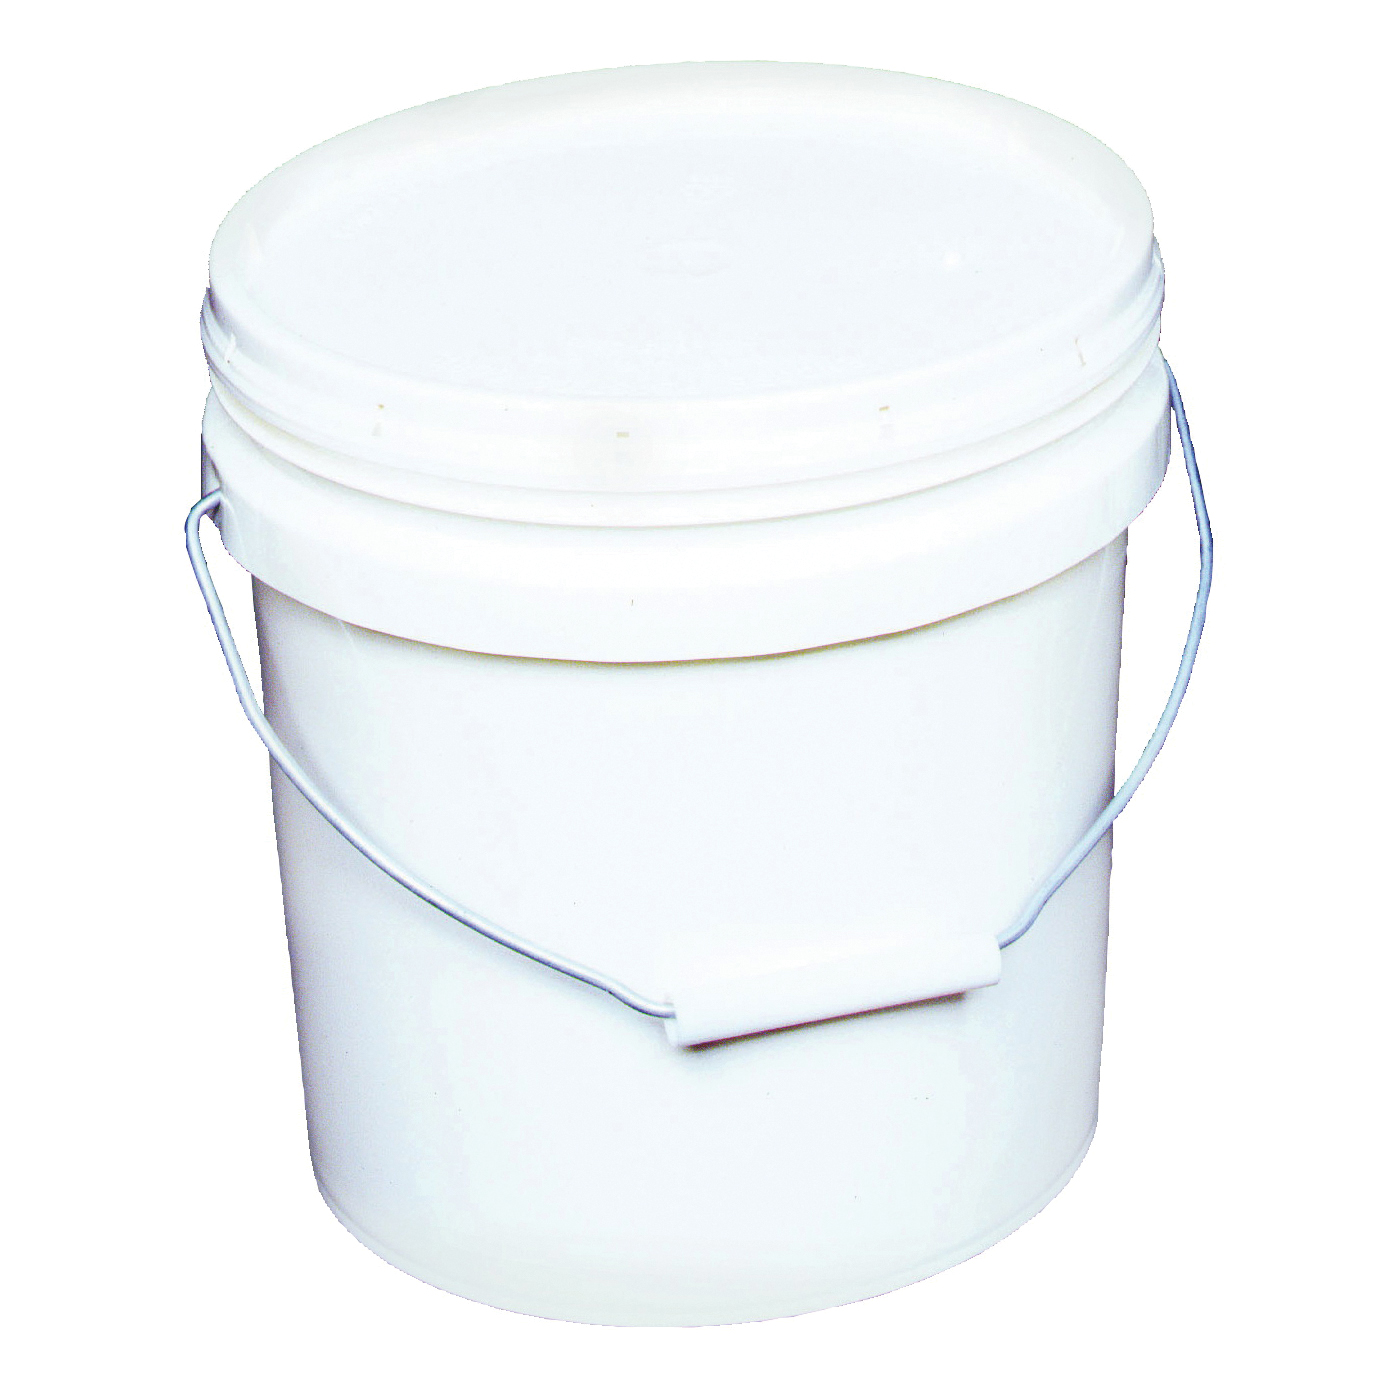 Picture of ENCORE Plastics 20256 Paint Pail, 2 gal Capacity, HDPE, White